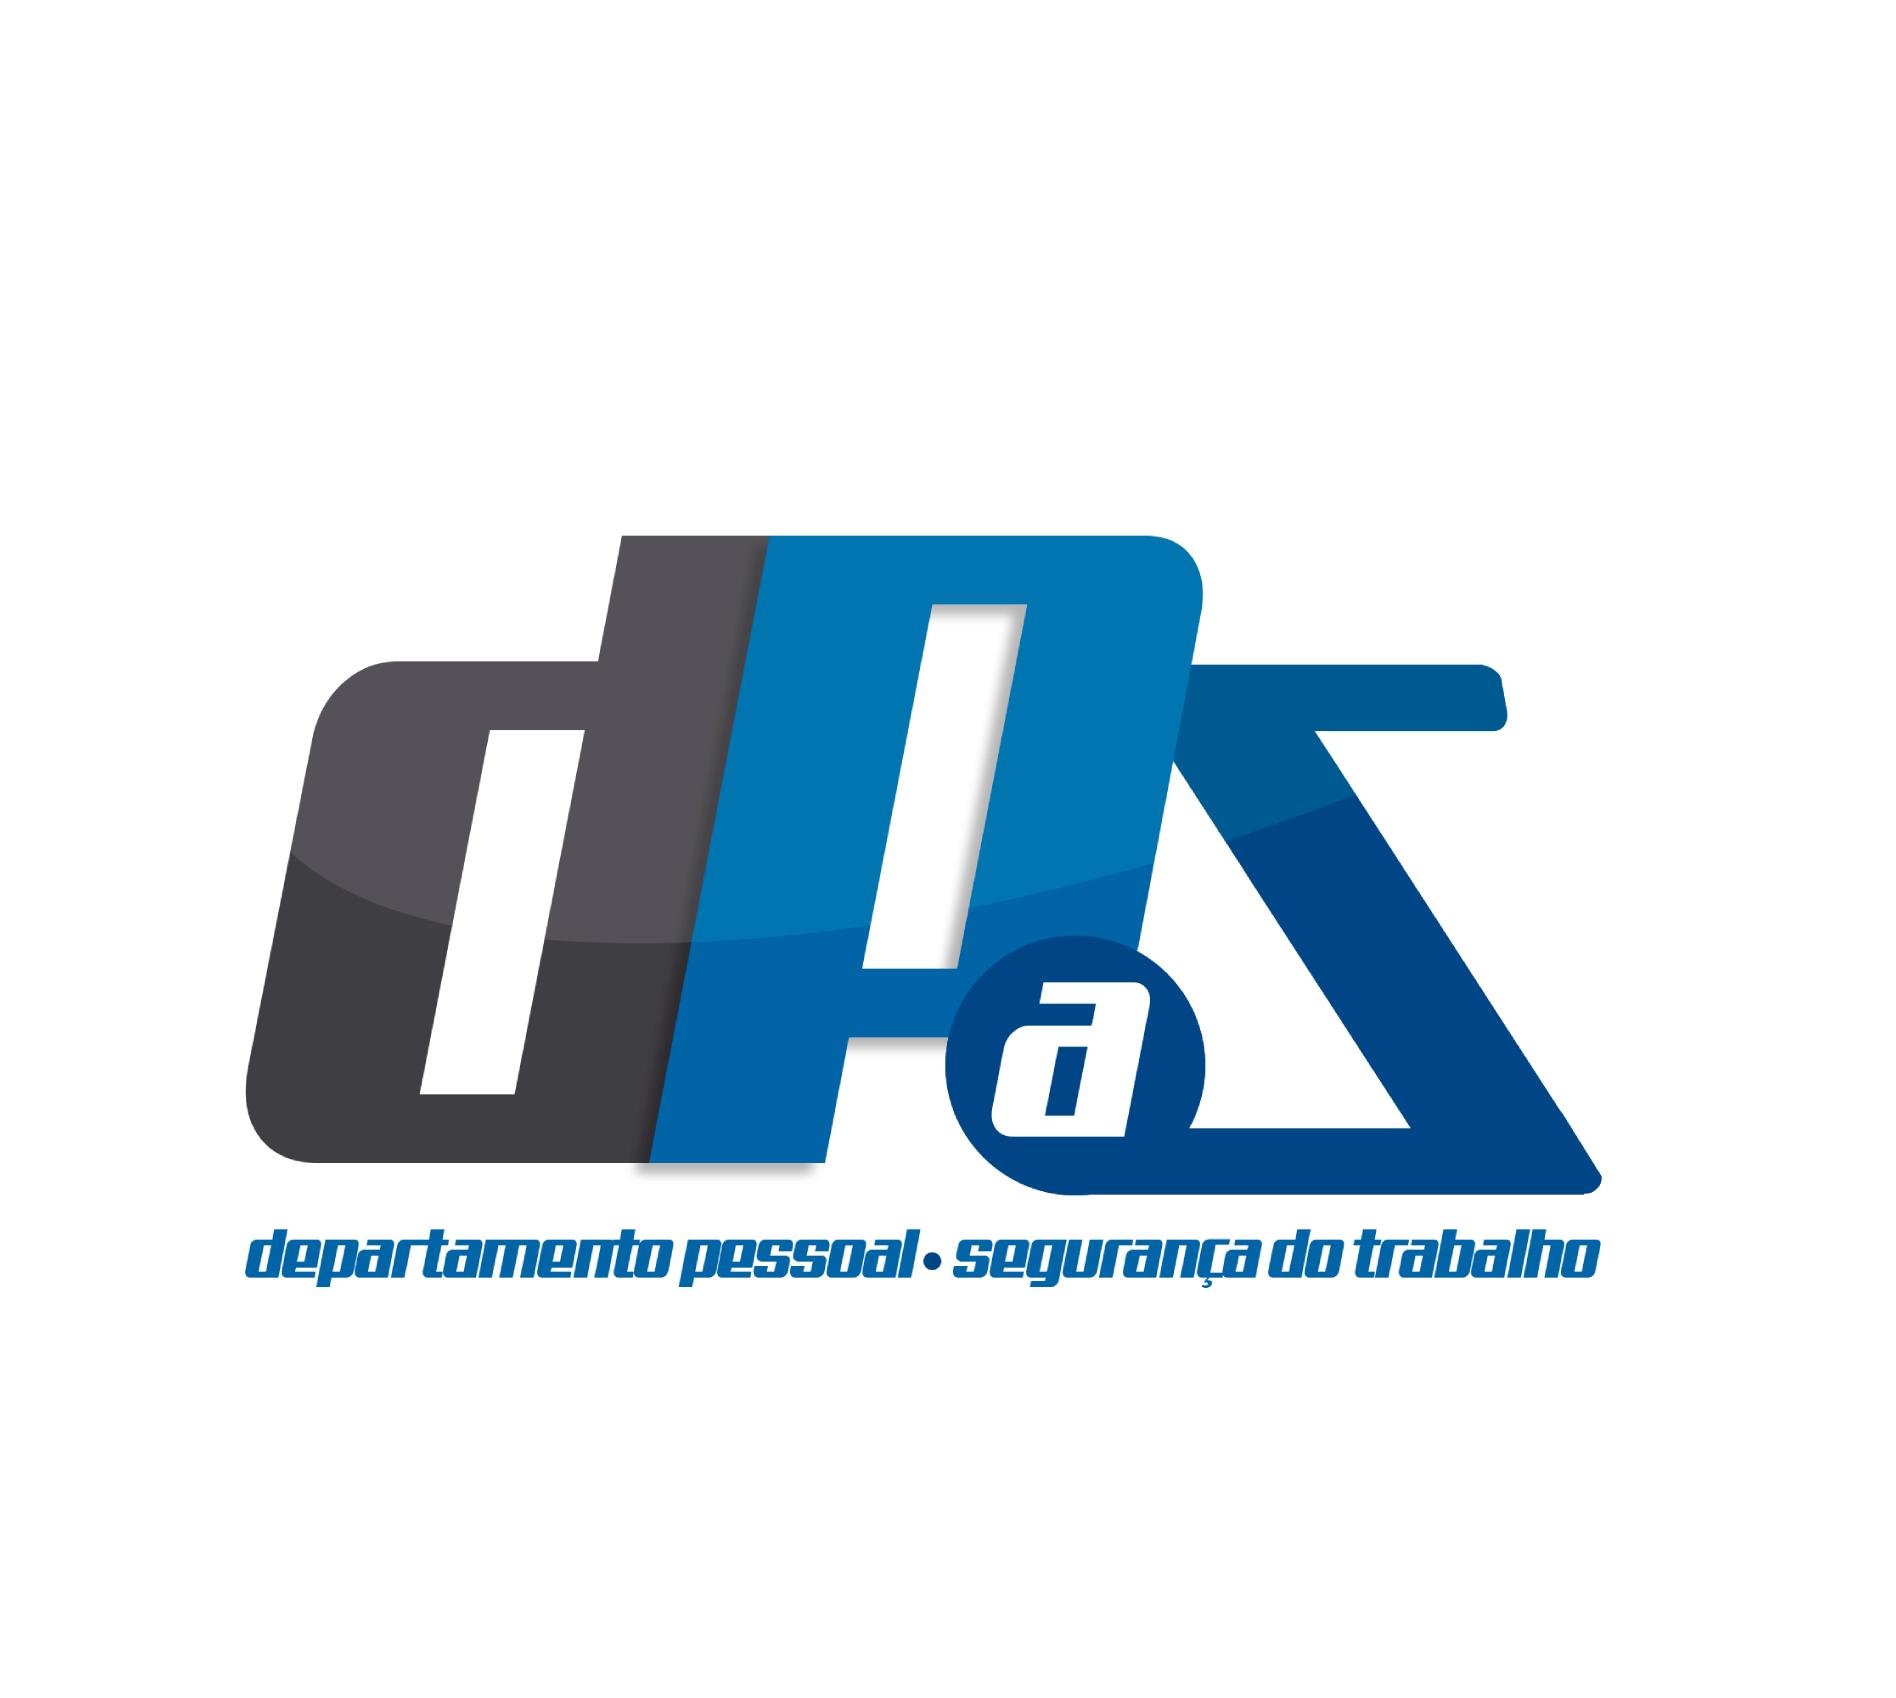 criacao-de-logotipo